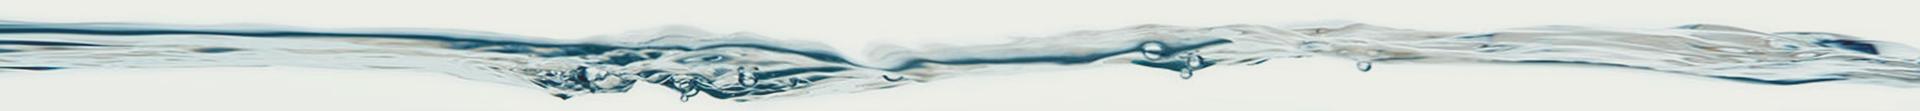 divider-water-only-neu